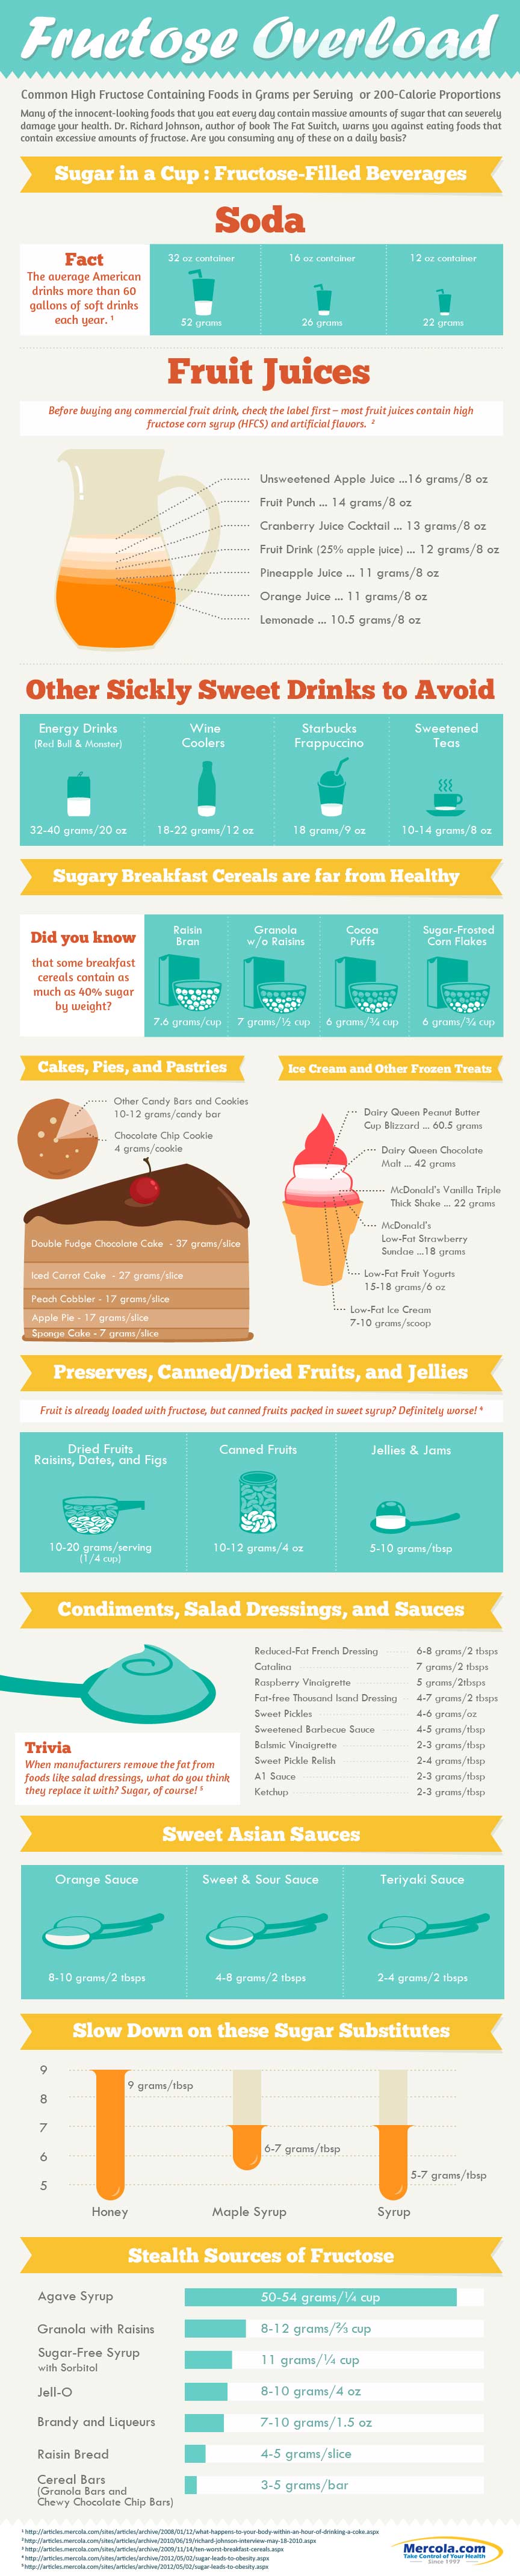 Fructose Hazards Infographic